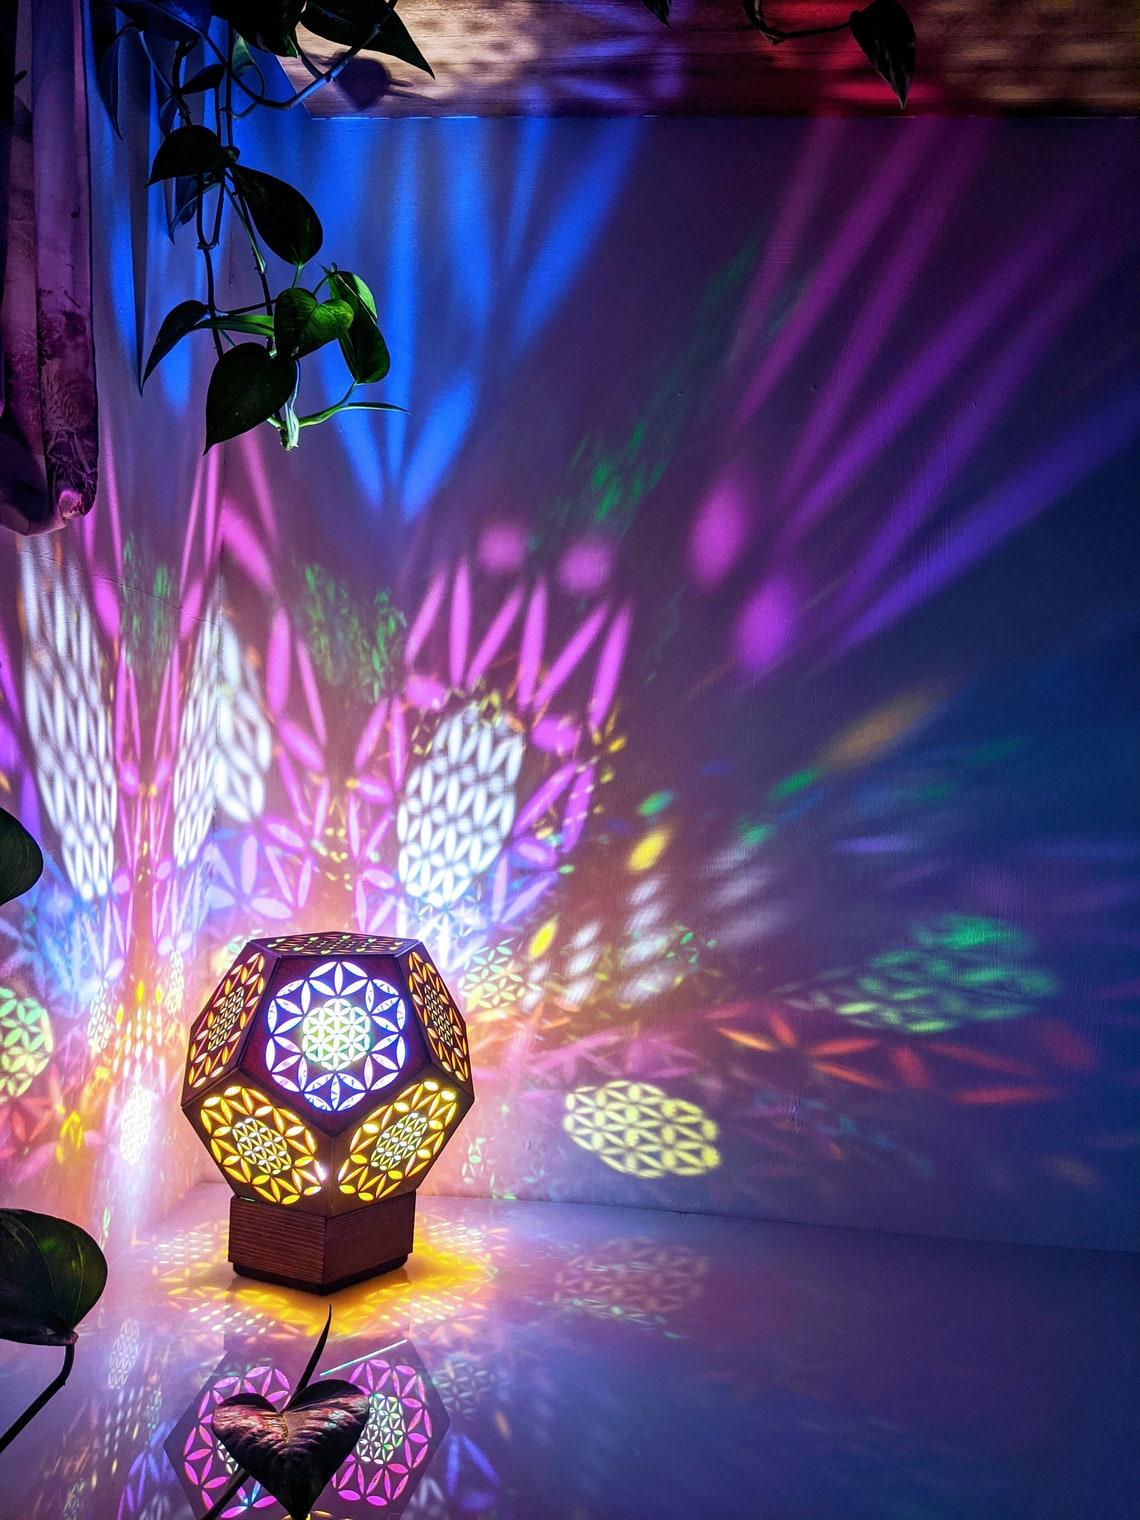 Wooden Lamp,  Flower of Life Lamp, Flower of Life, Lighting, Sacred Geometry, Wood Lamp, Wood Light, Pink Lamp, Shadow Lamp,